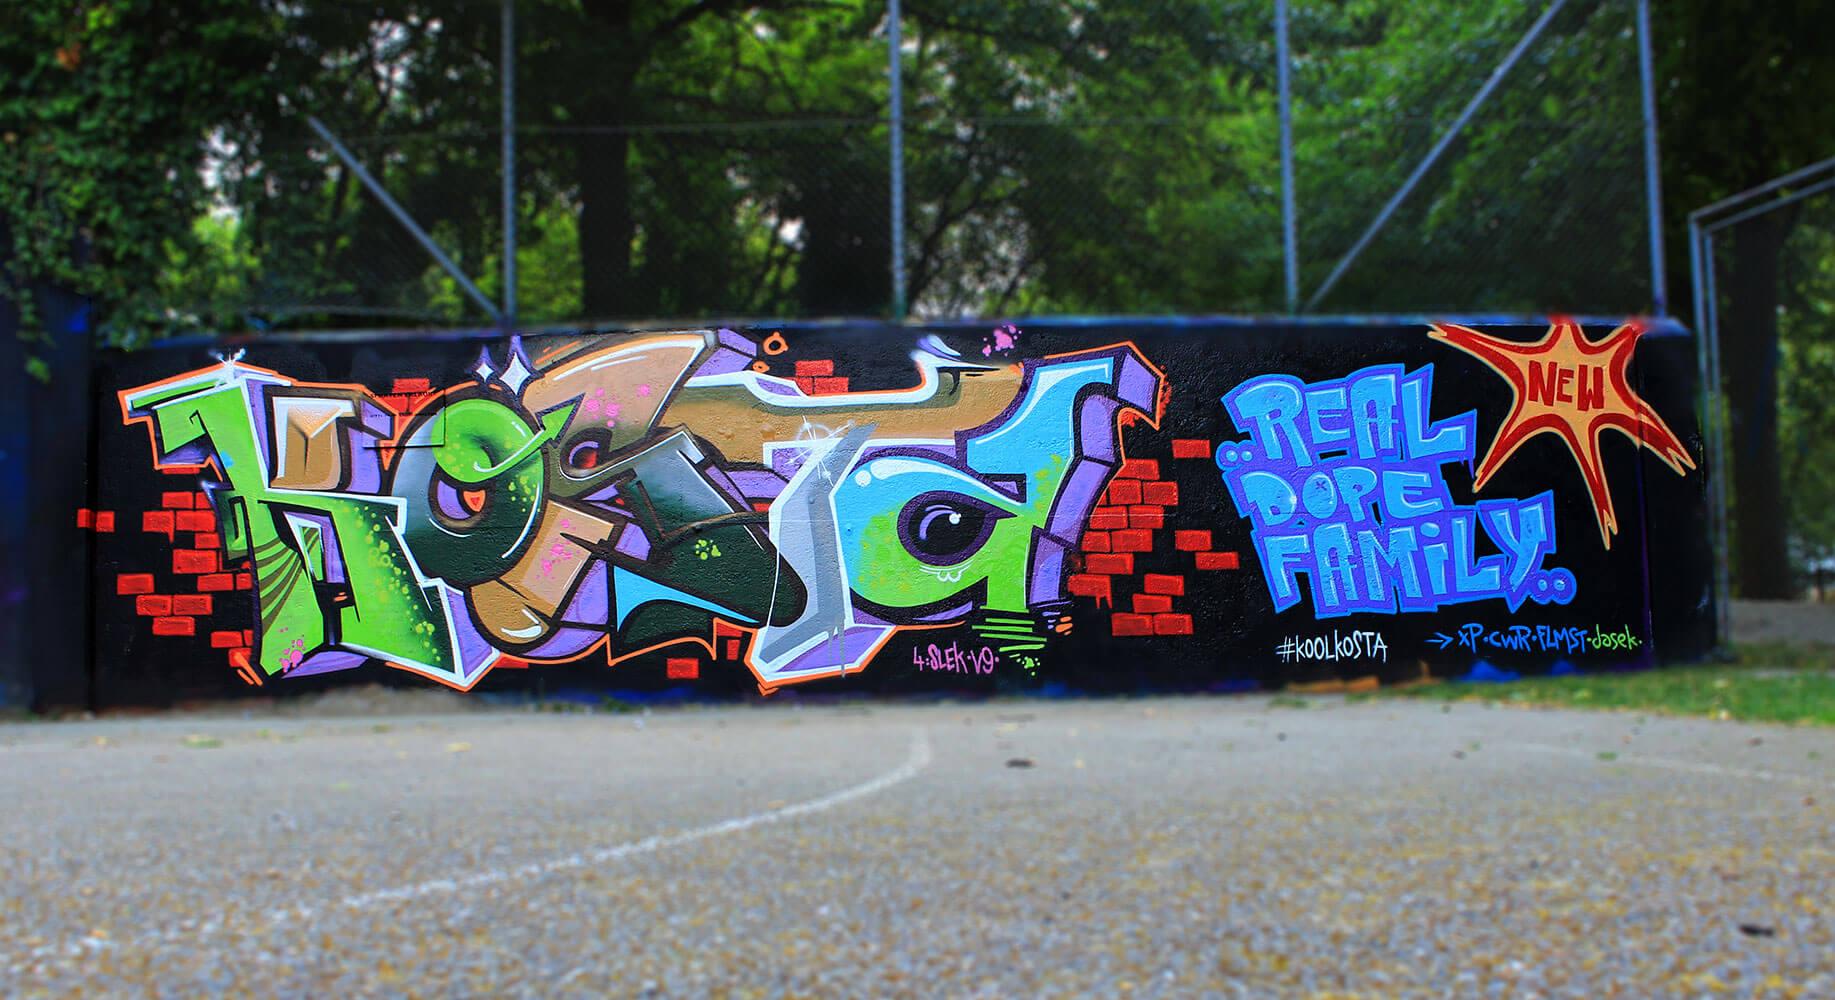 Kosta Graffiti - Max Kosta / Basel (CH) 2014